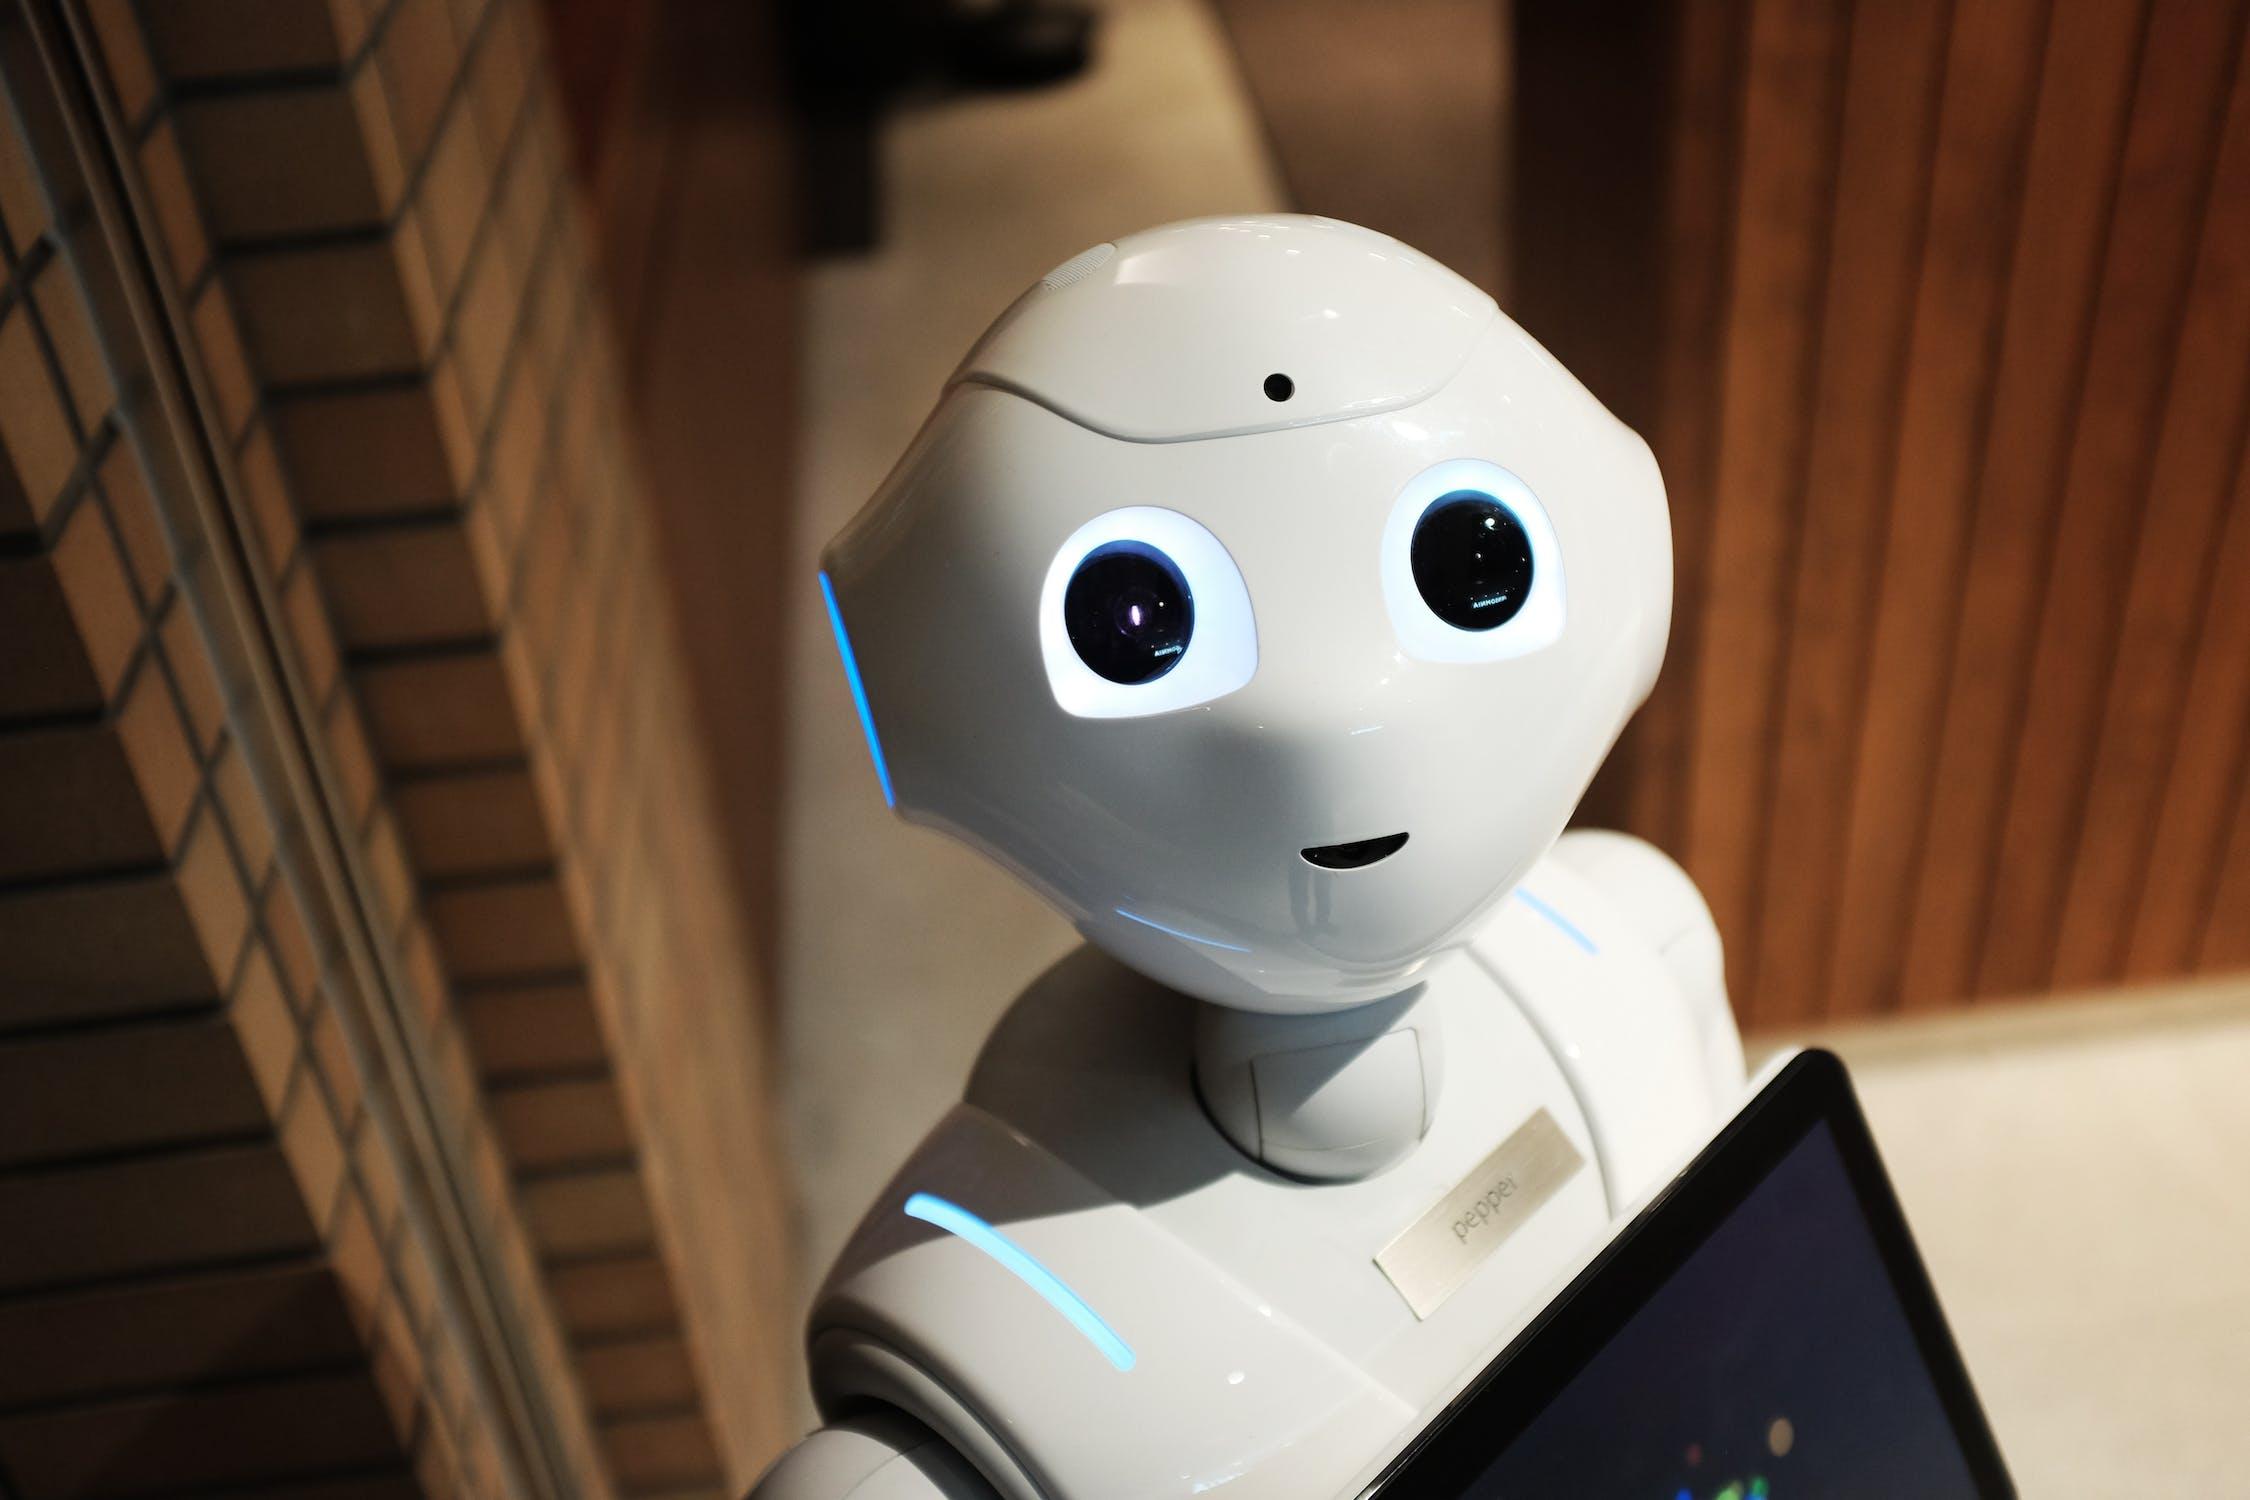 Future Technology: The Top 5 Future Technologies